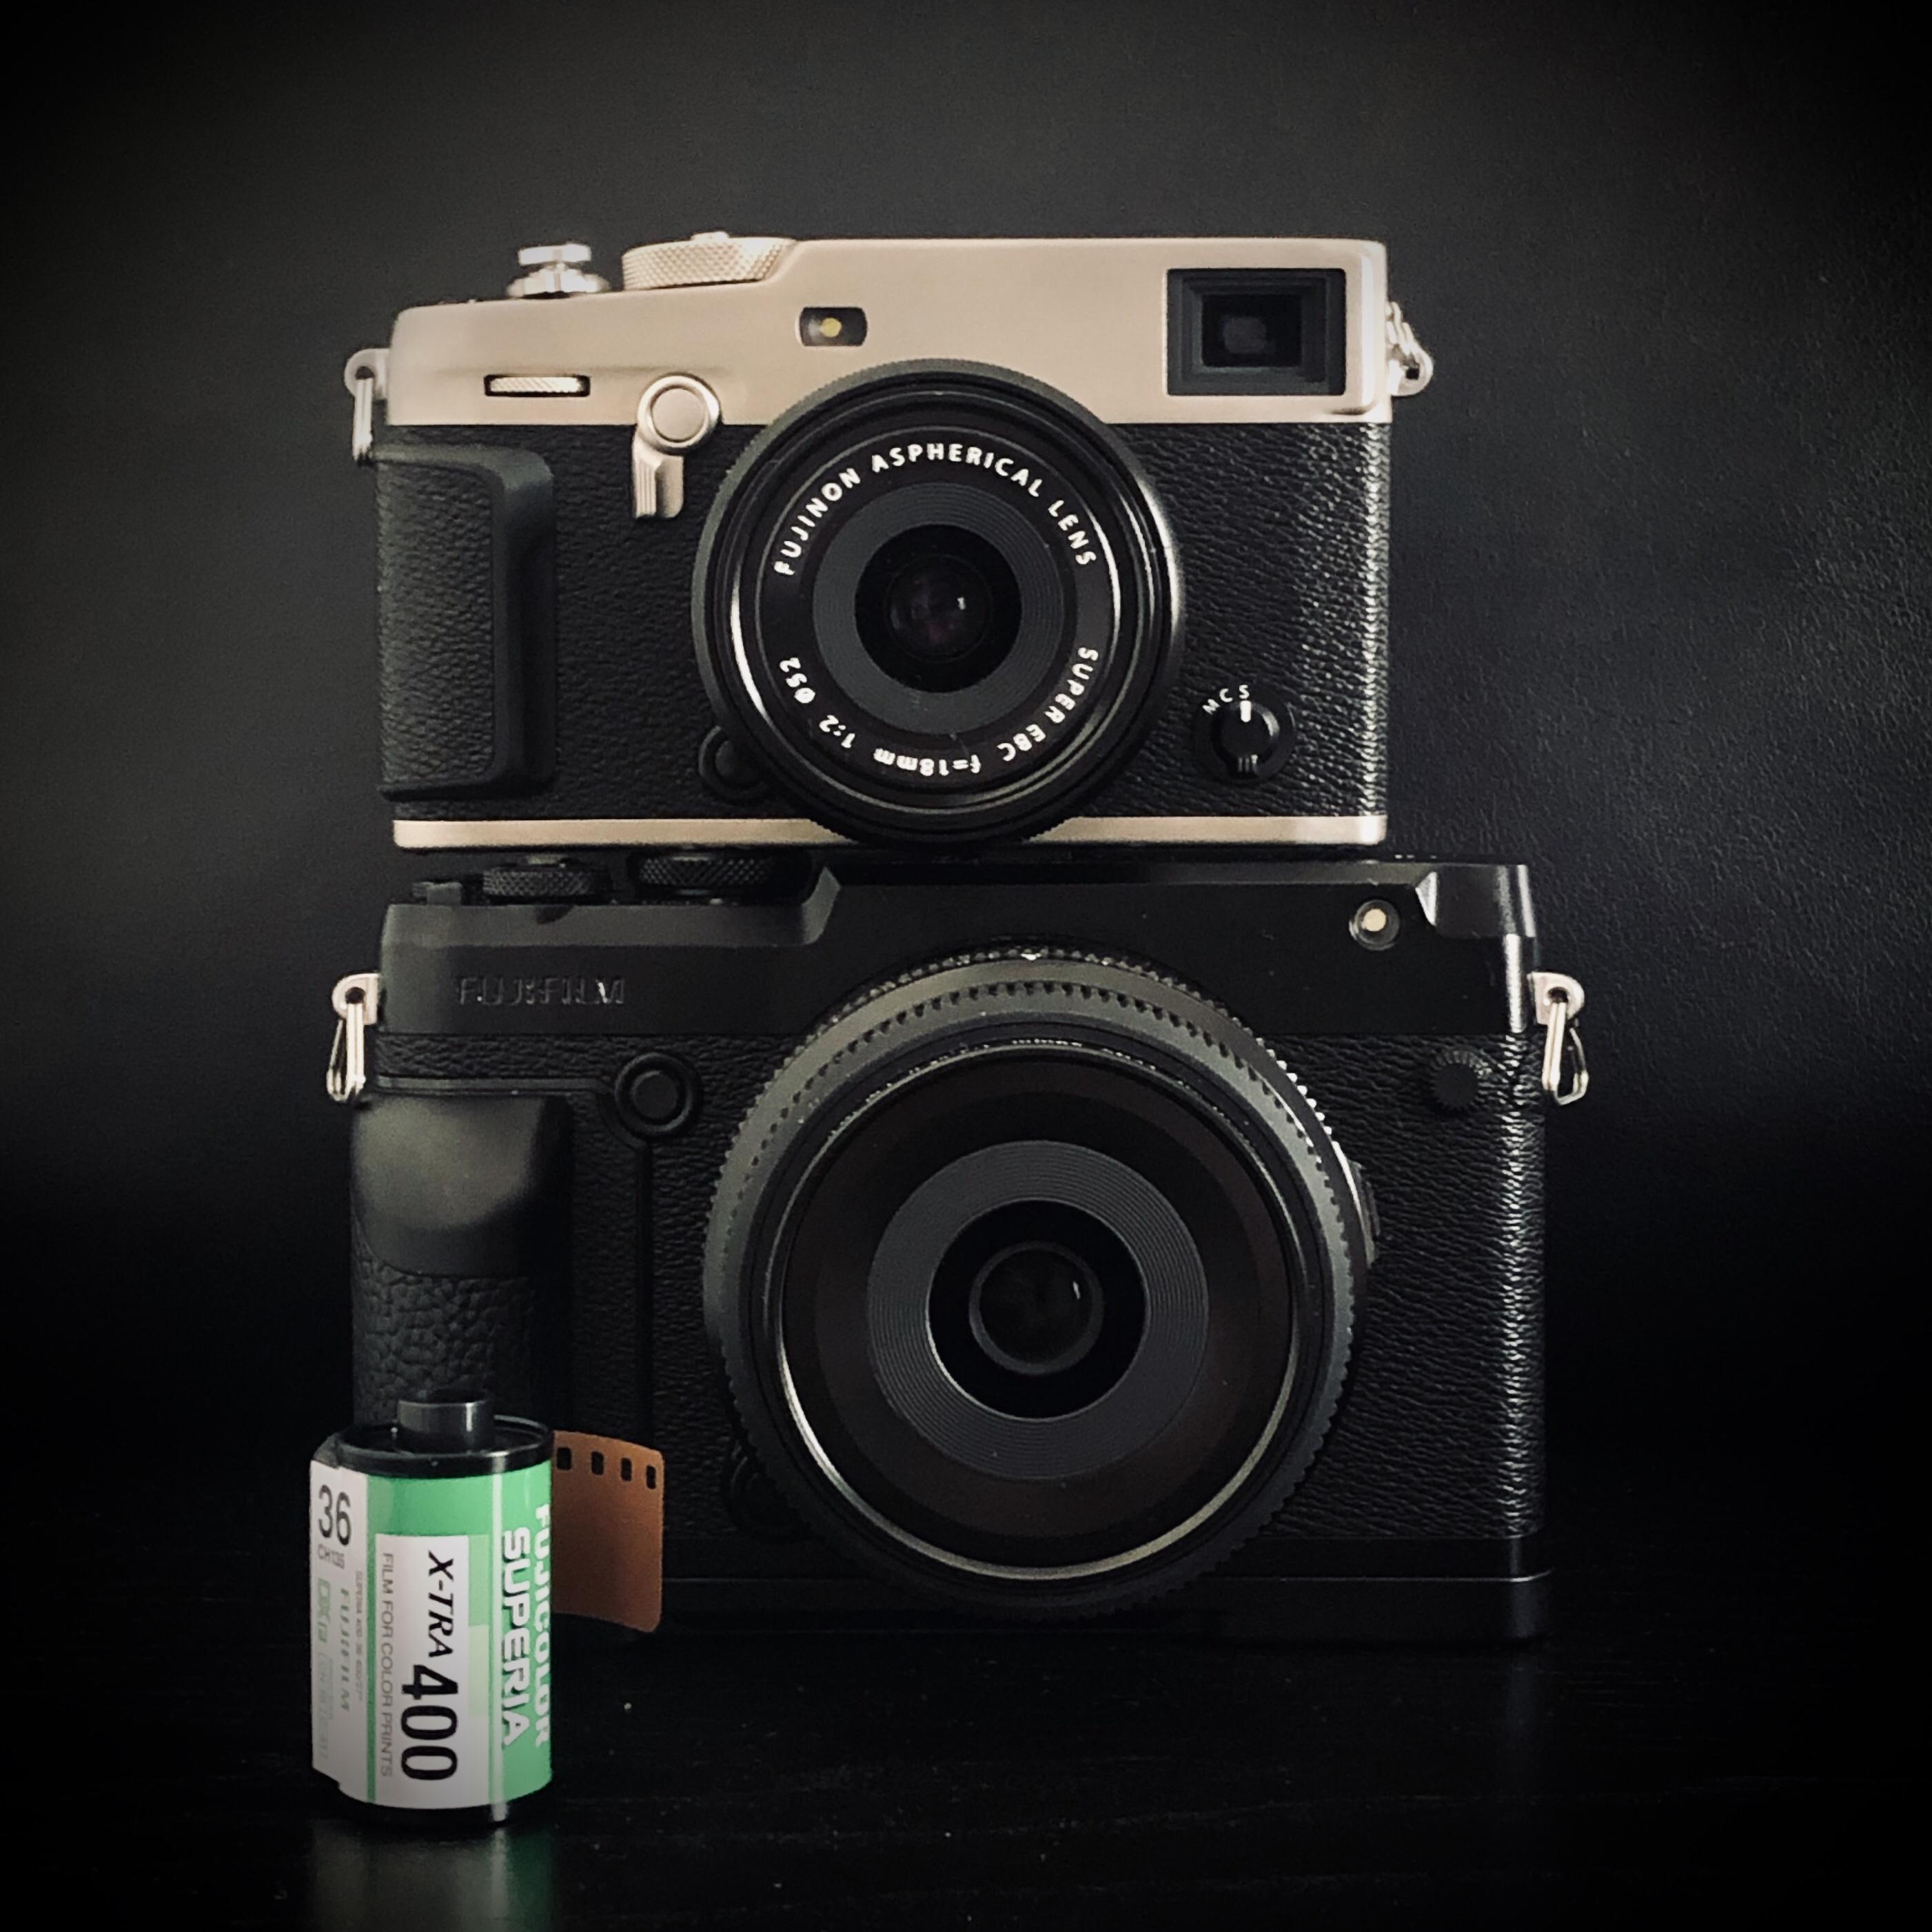 Fuji in-camera RAW processing - Measuring Light